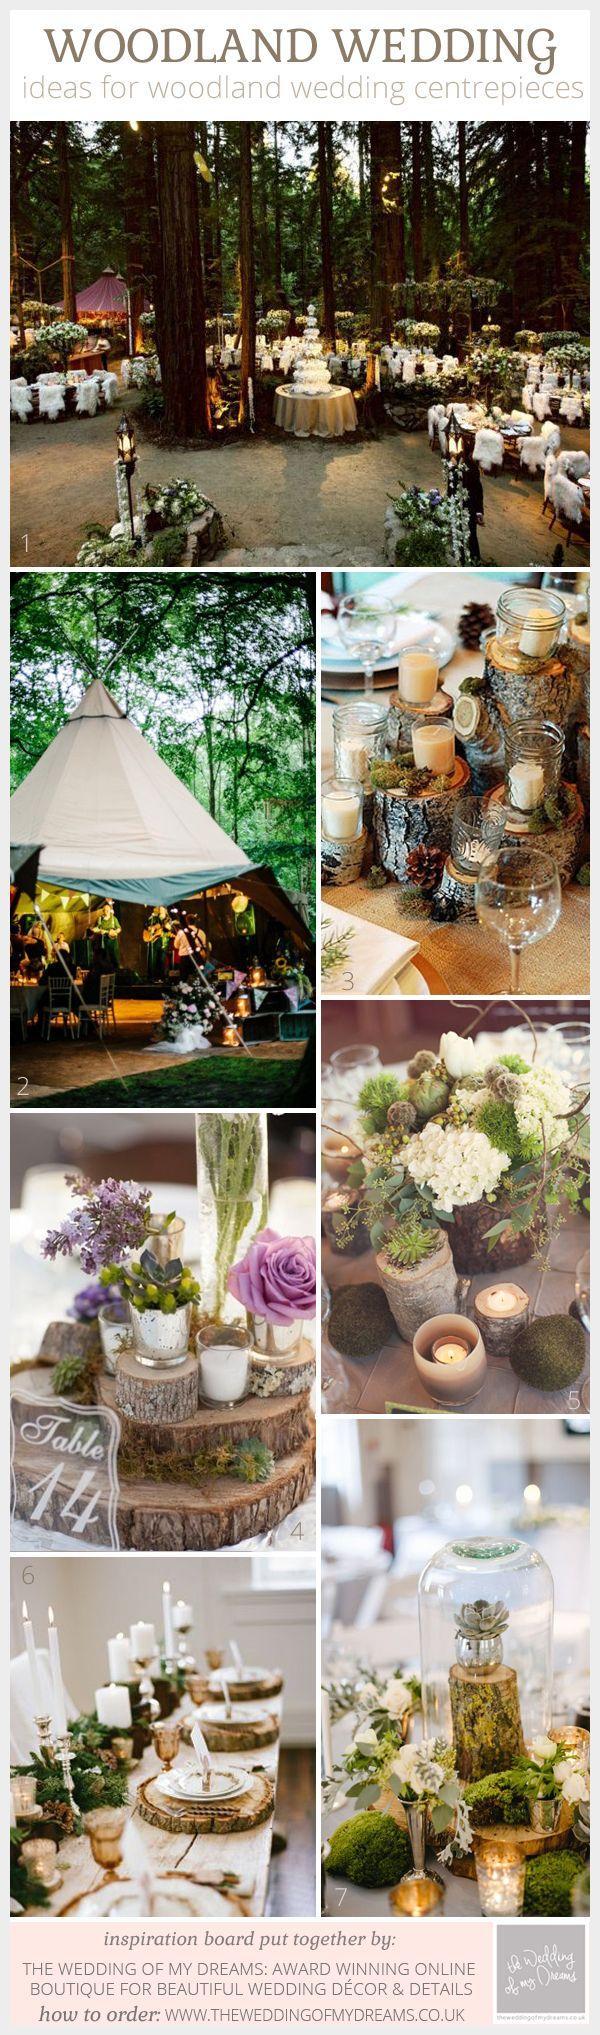 Mariage - Discover These Amazing Woodland Wedding Centrepiece Ideas